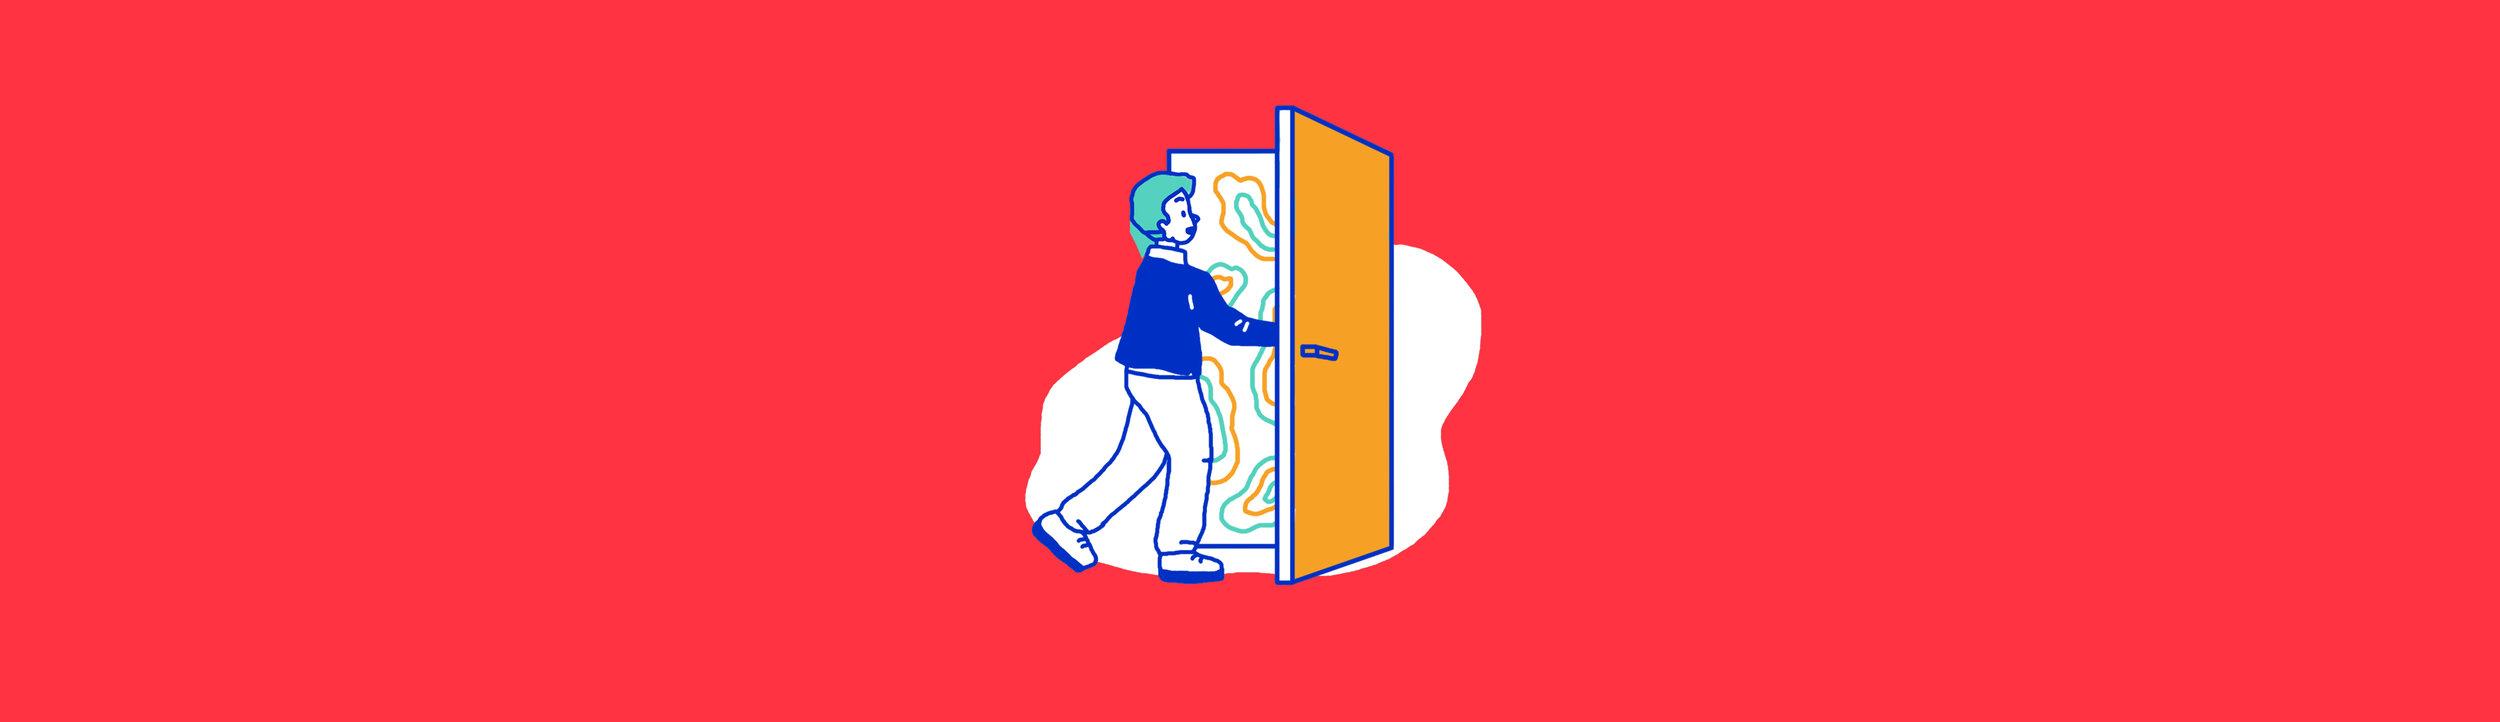 Quitting Corporate life.jpg